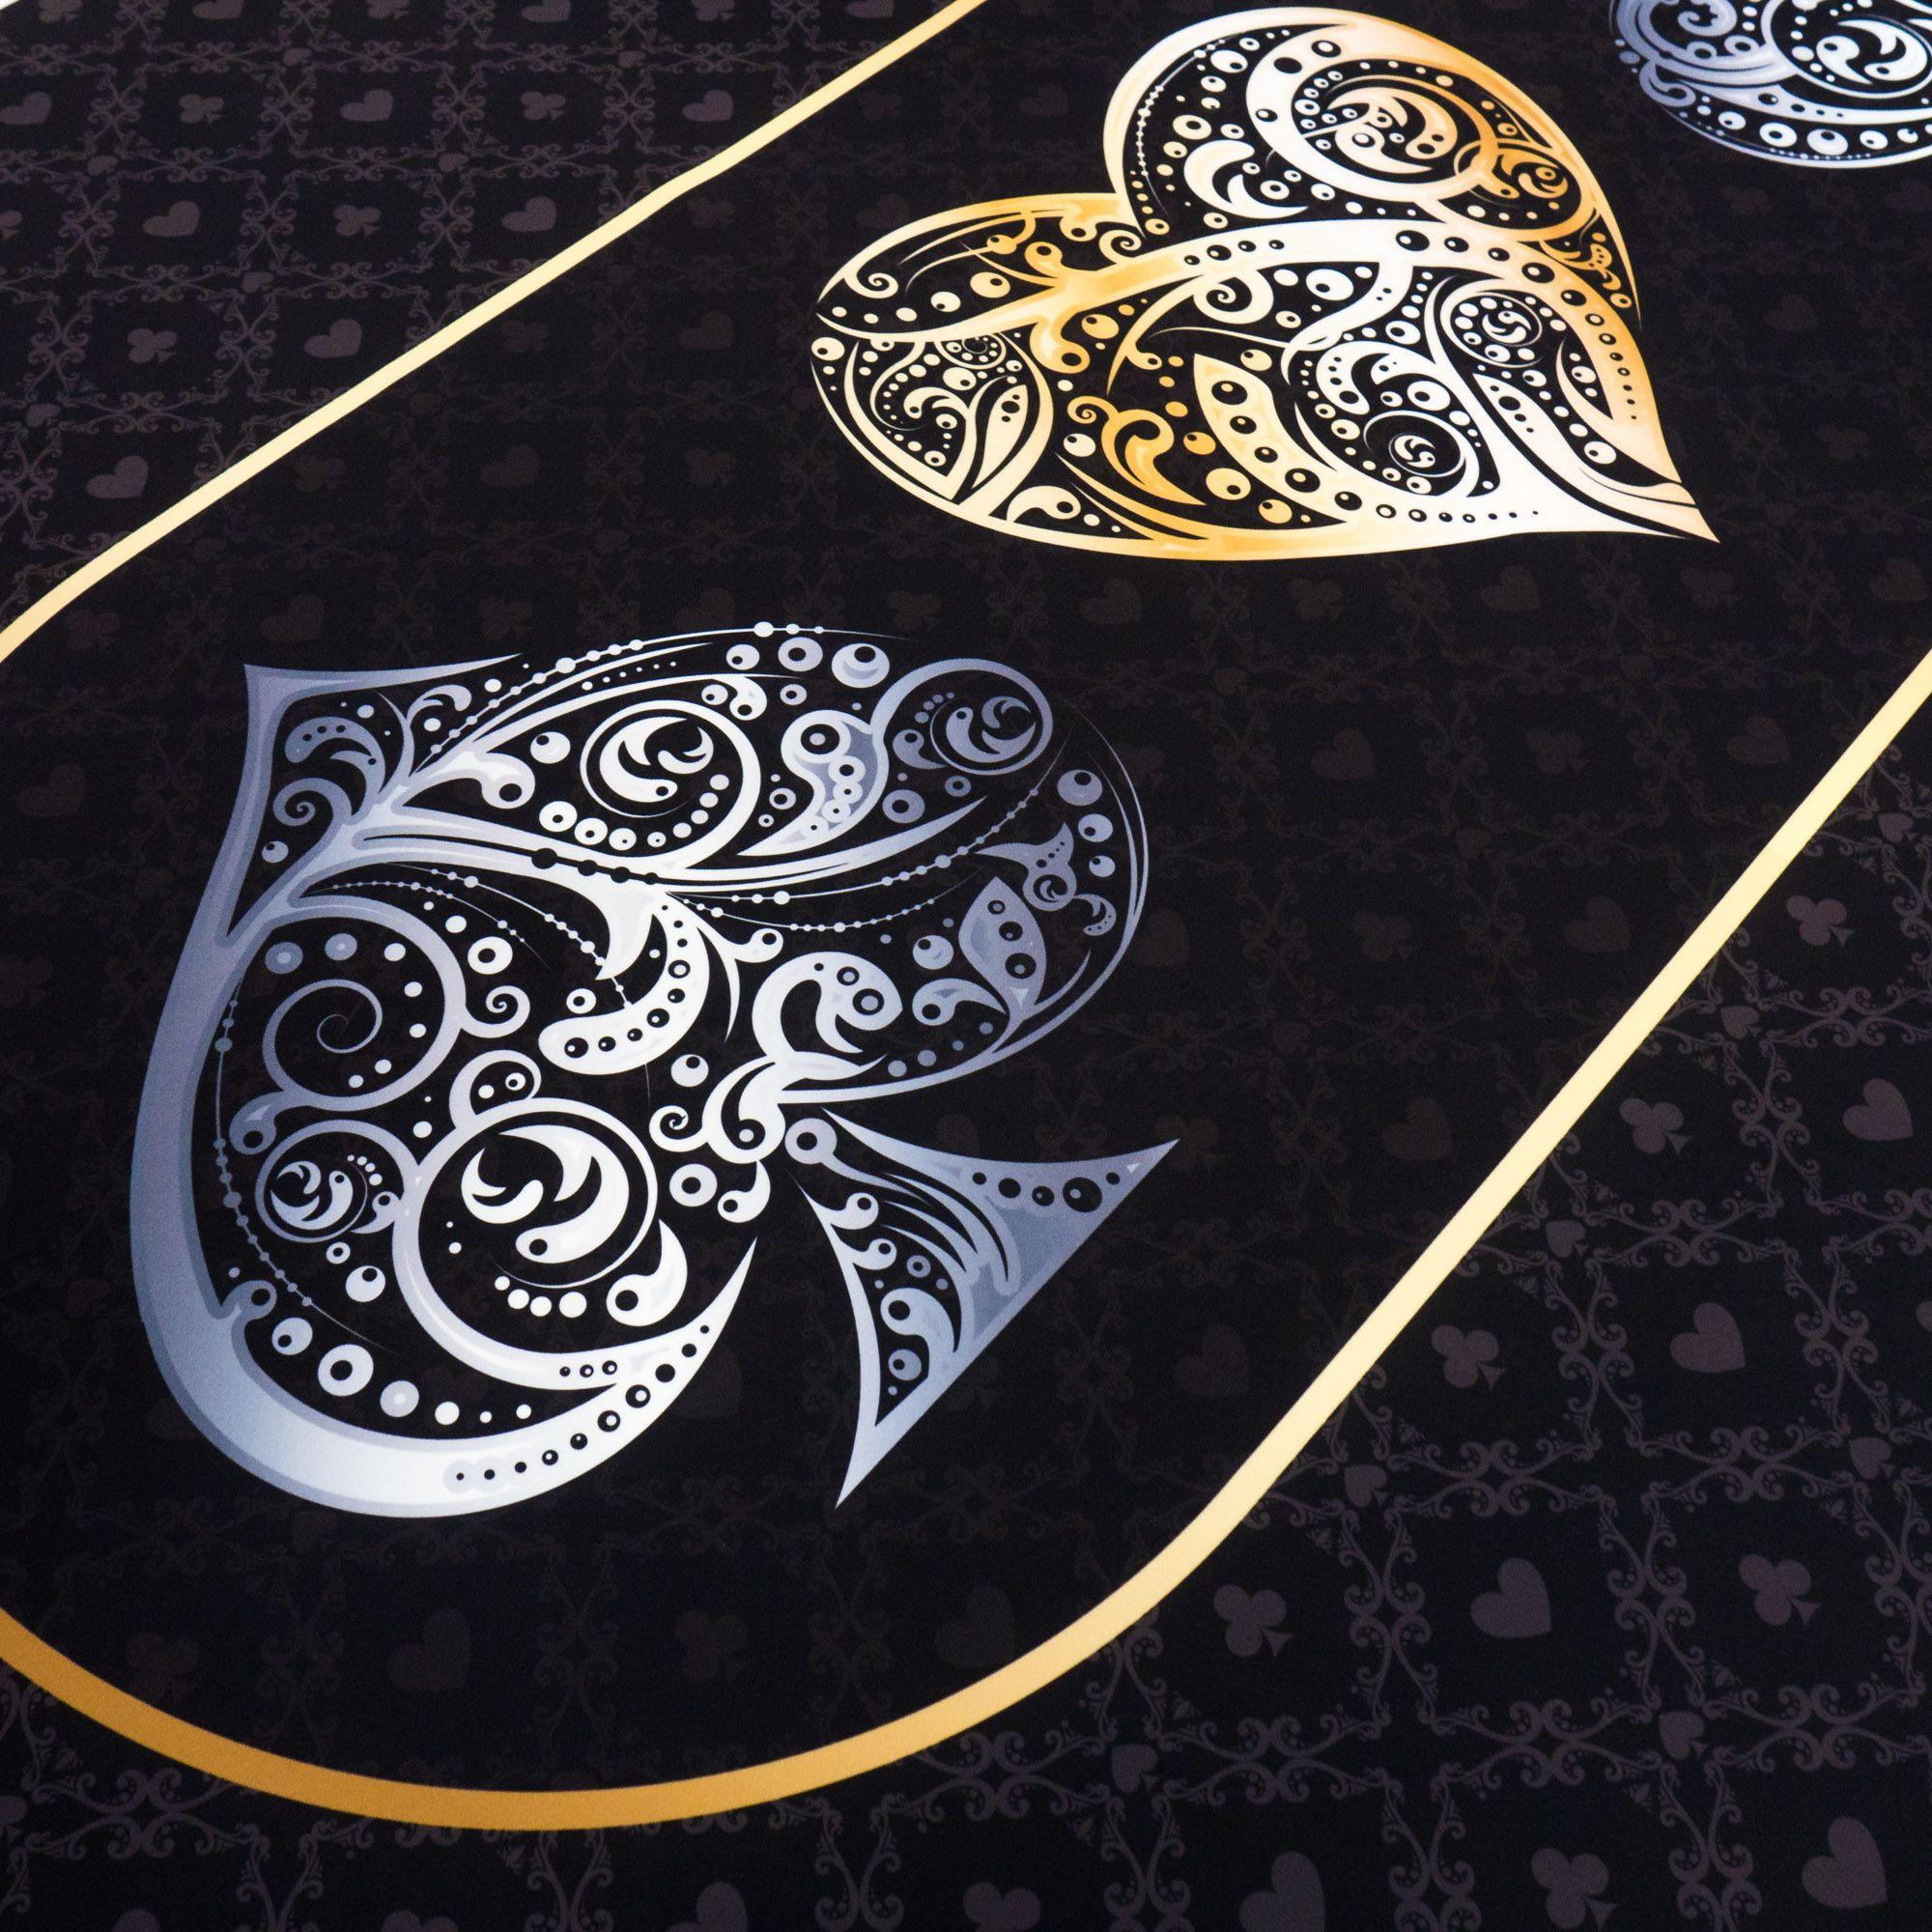 Slick graphics on this custom table felt Design your custom